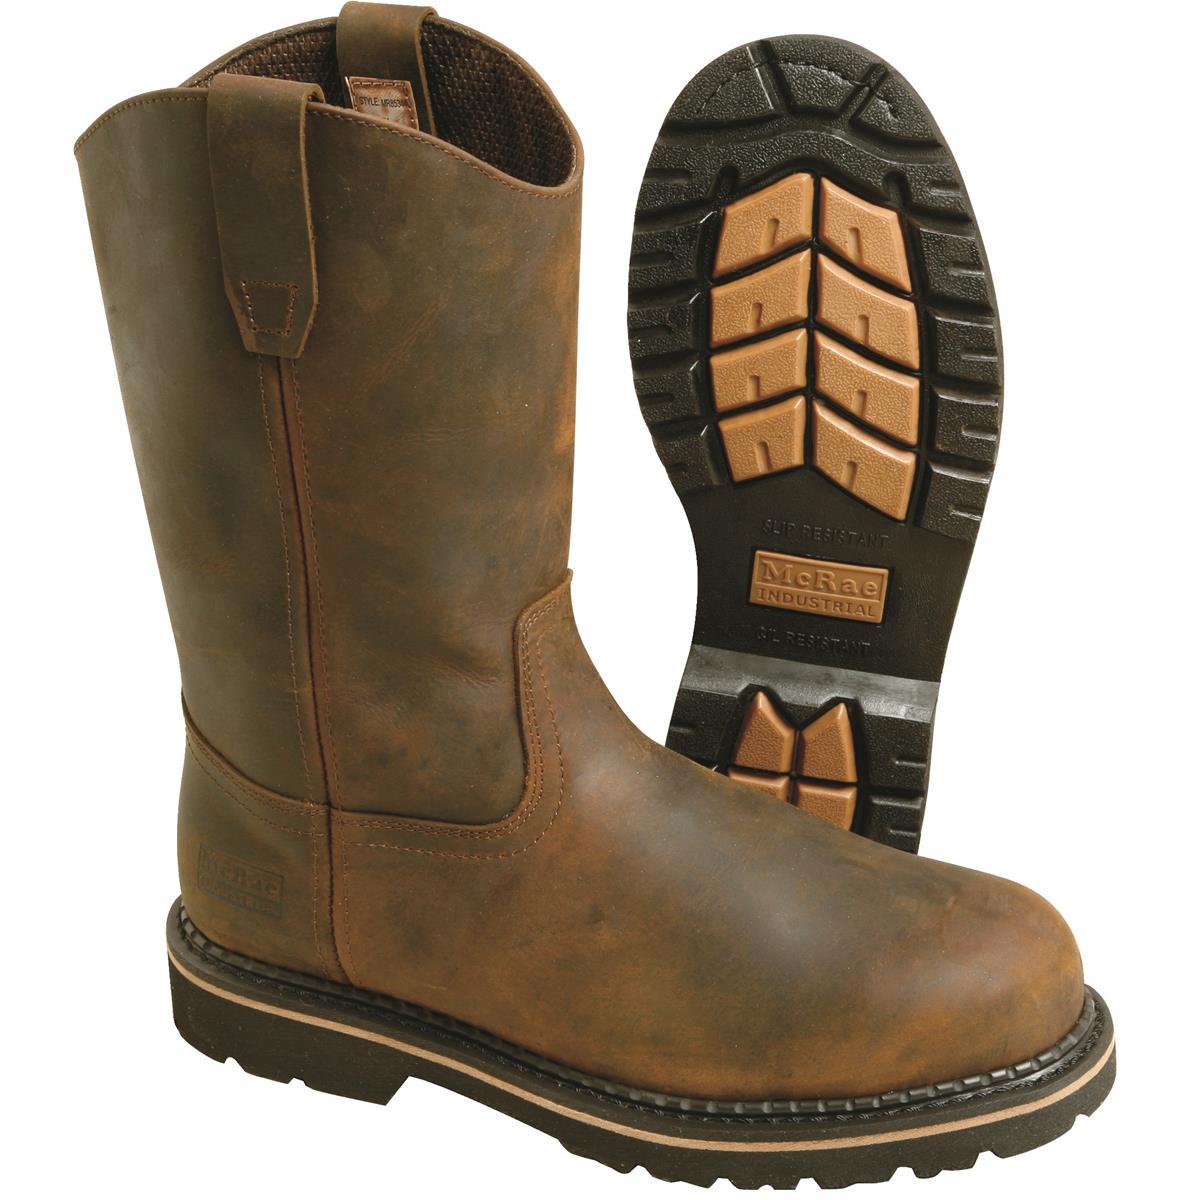 wellington boots mcrae industrial 11 zalpdbt